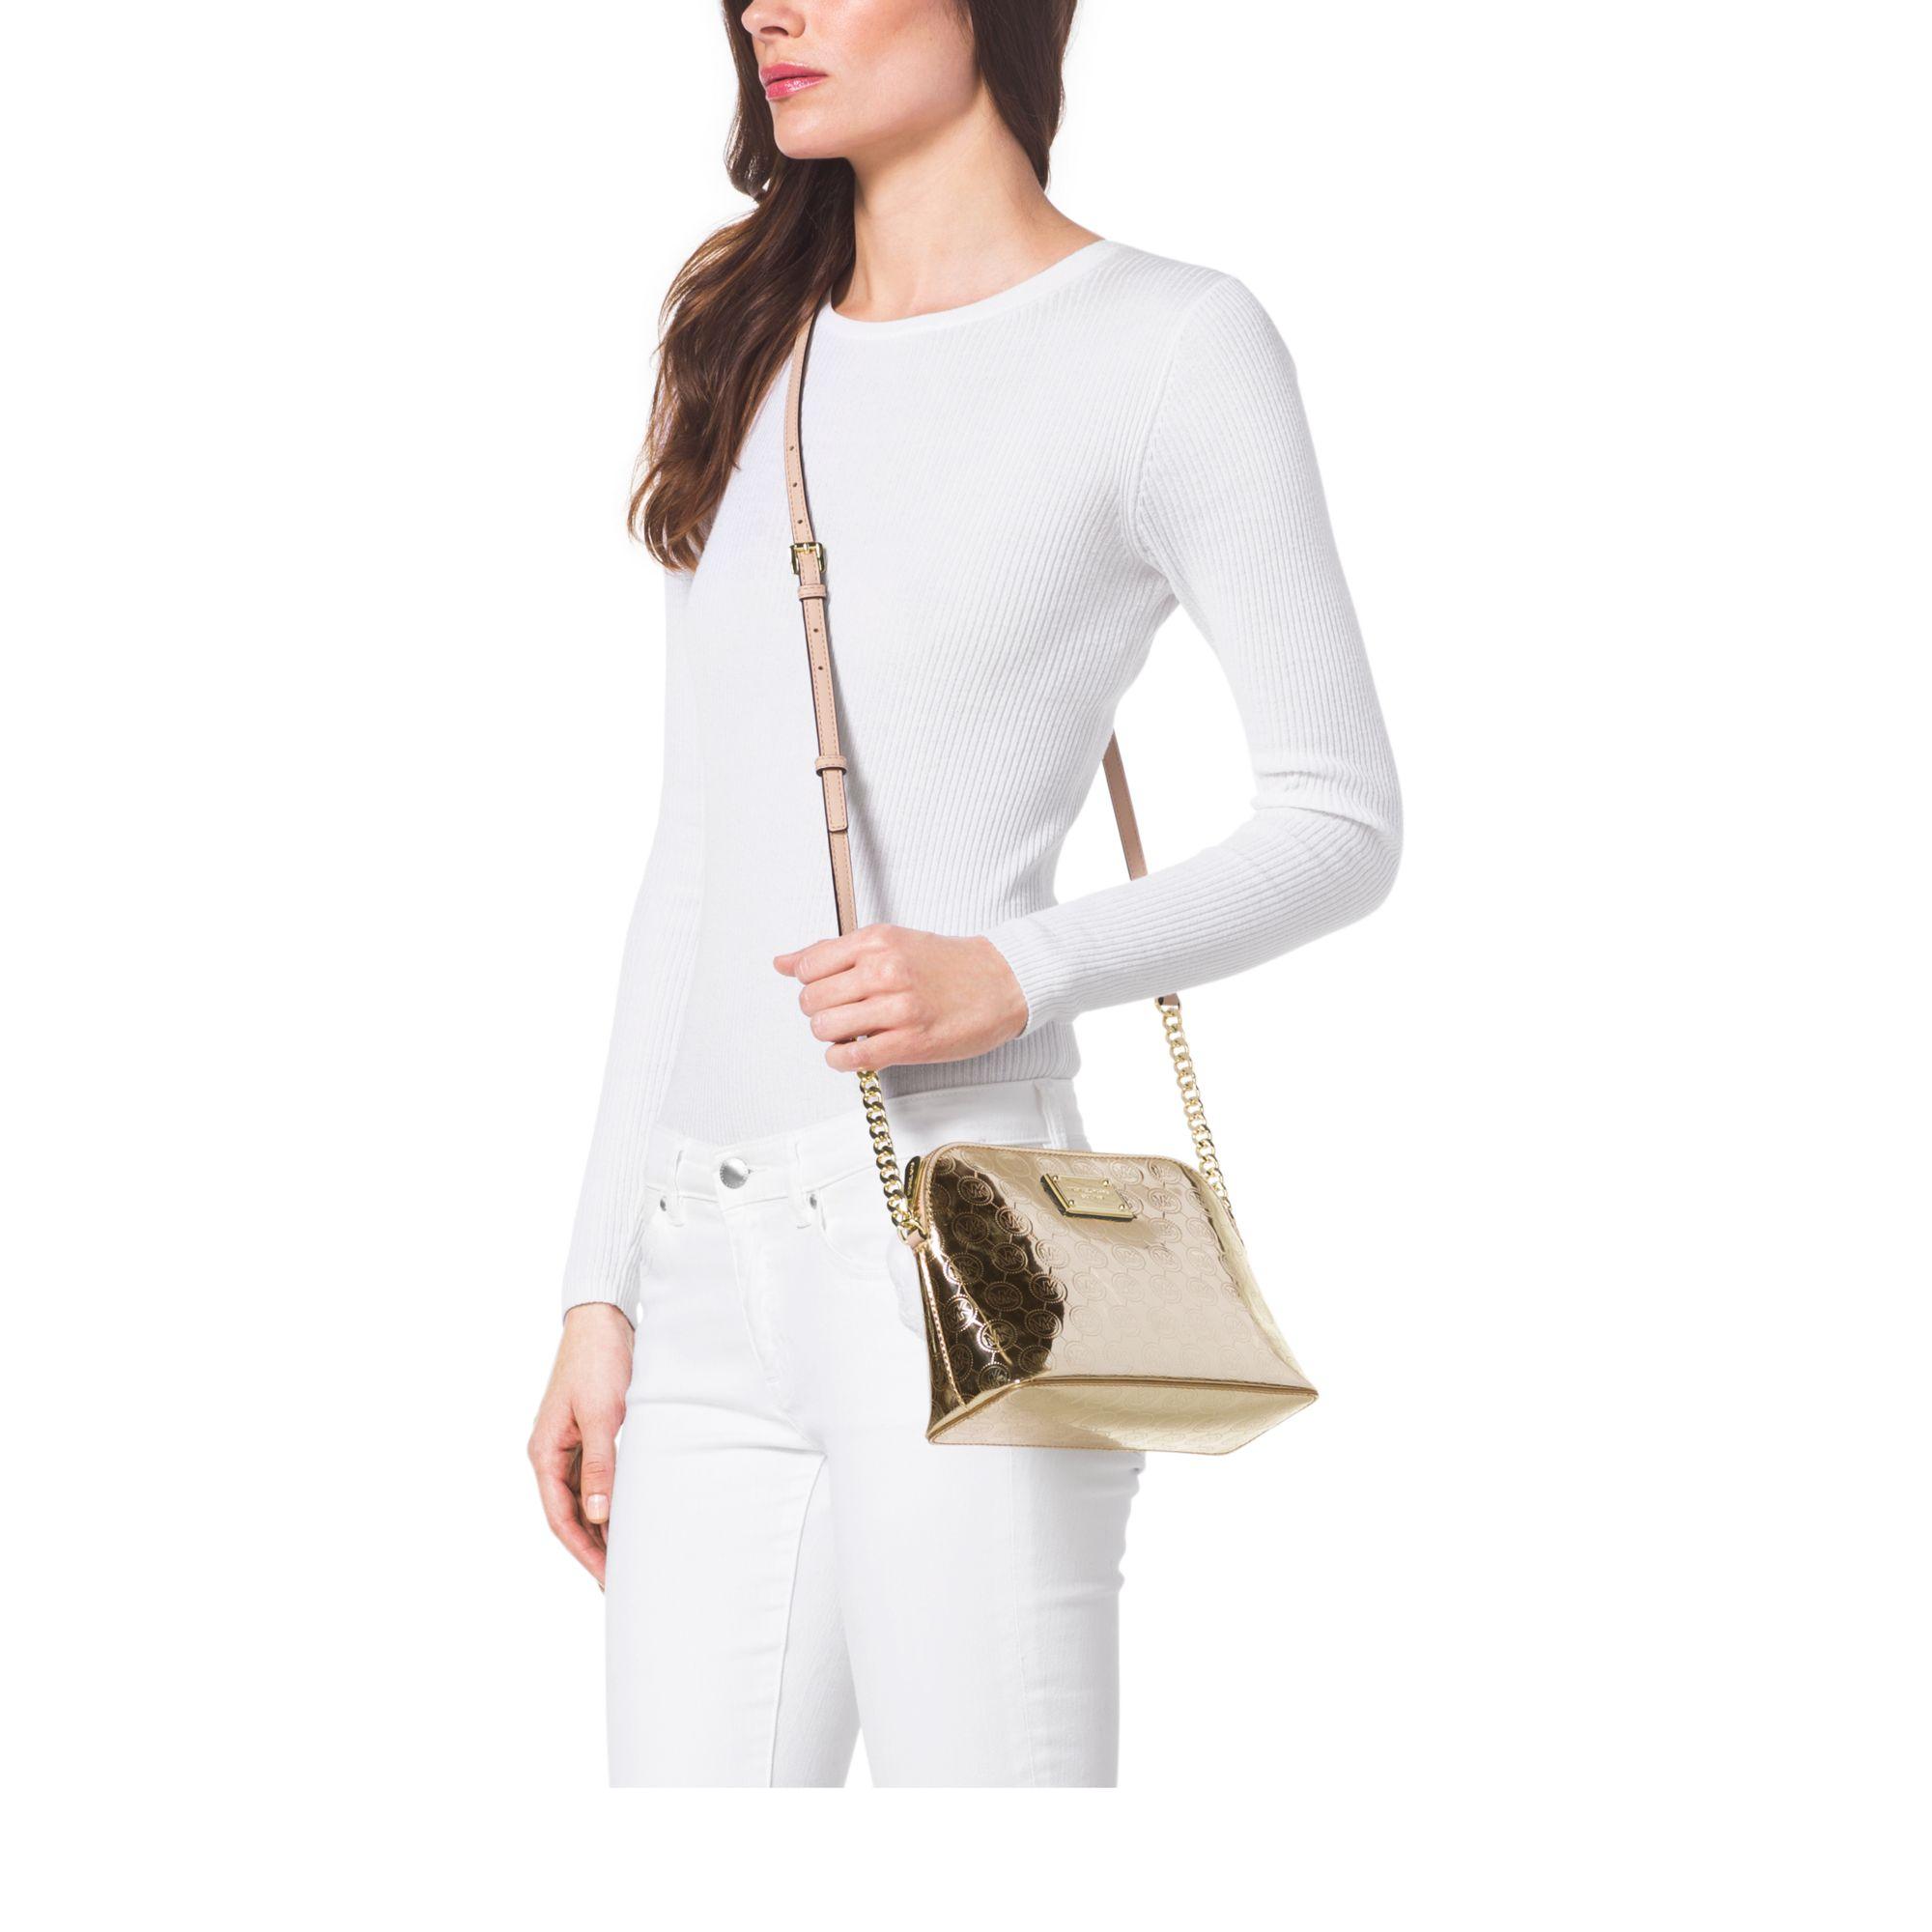 9c0789748d93 Gallery. Women s Michael Kors Cindy Women s Leather Messenger Bags ...